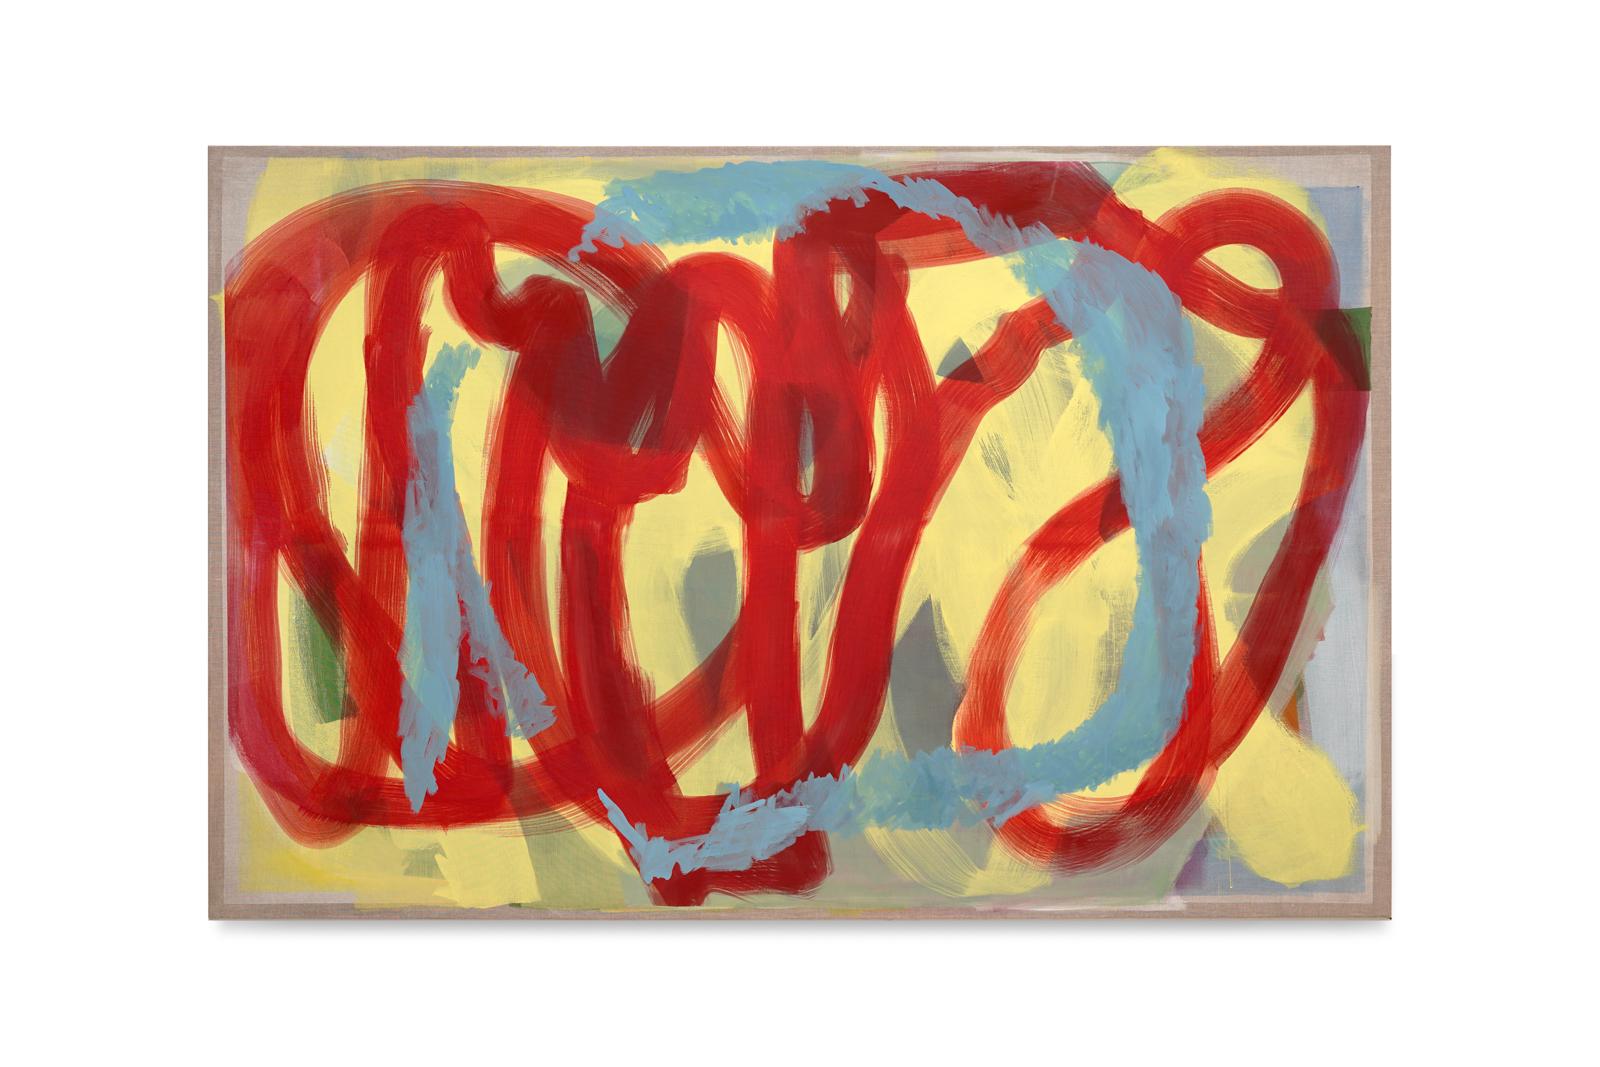 gelb rot blau, 2020, 130x200 | giallo rosso blu, 130x200